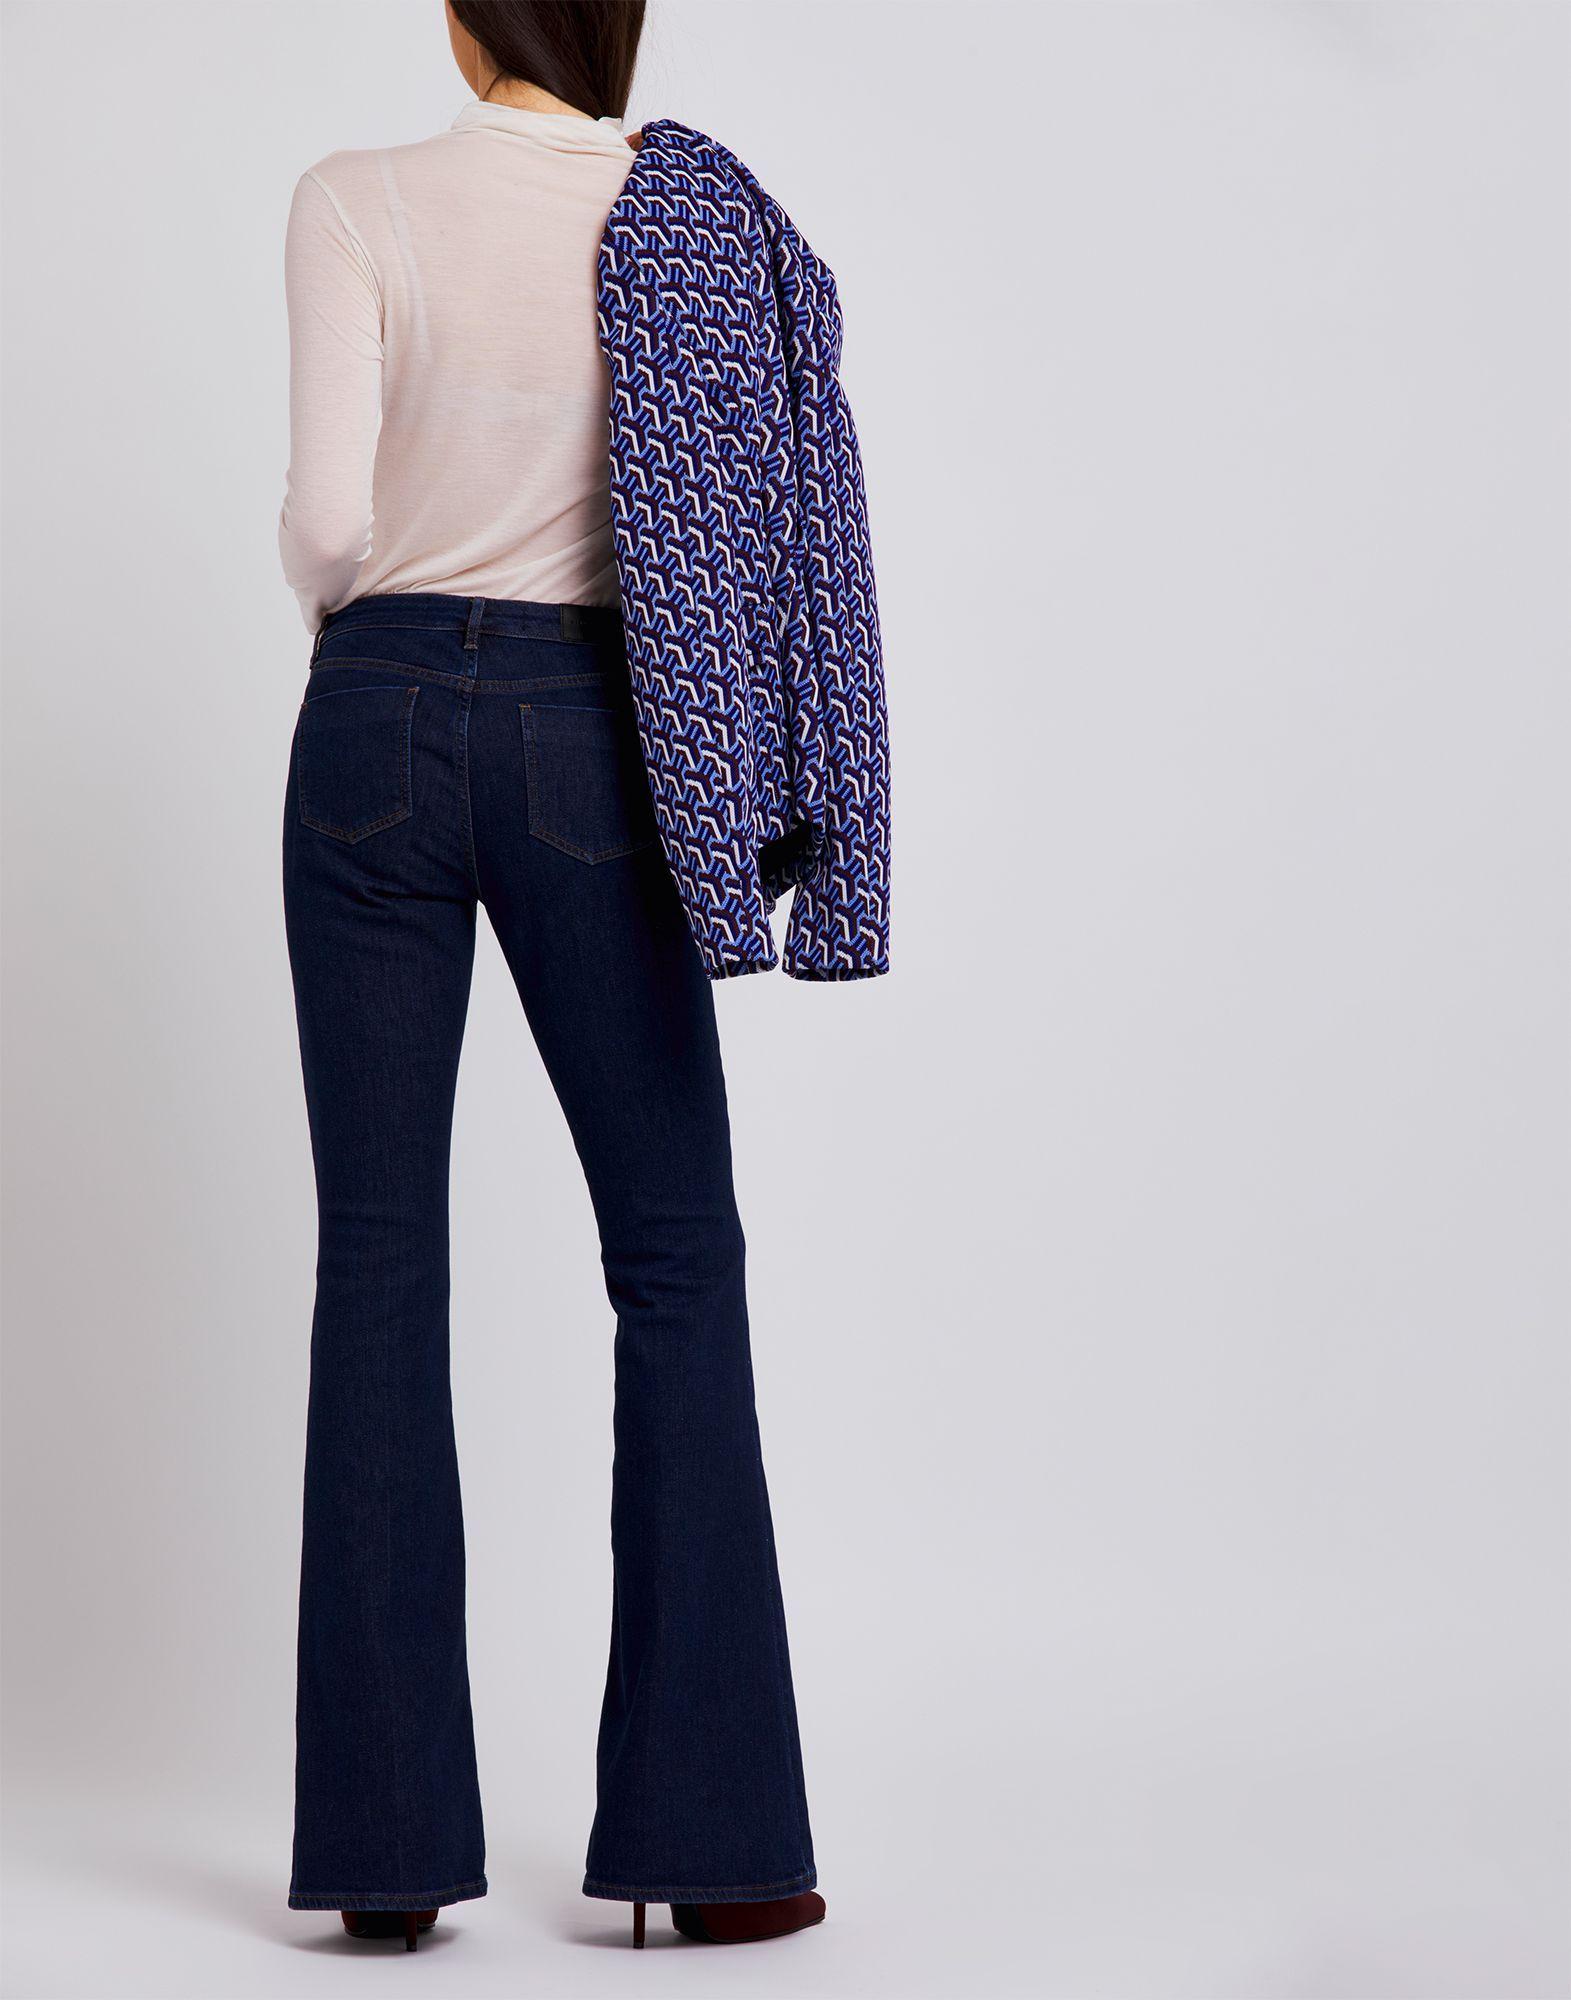 Victoria, Victoria Beckham Blue Cotton Flared Jeans